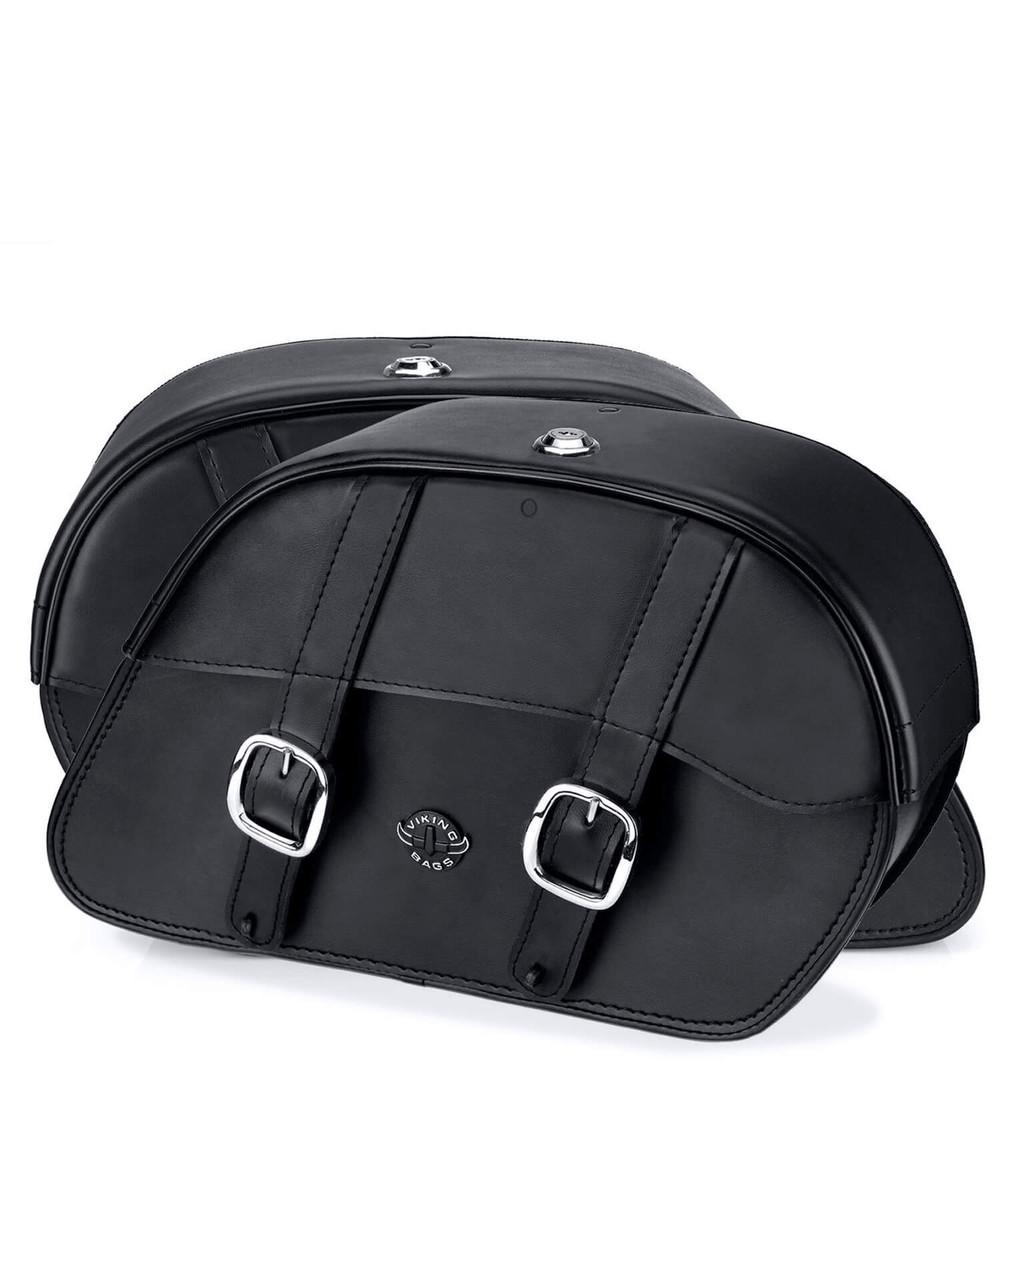 Viking Shock Cutout Large Slanted Saddlebags For Harley Sportster Iron 1200 Both bag view